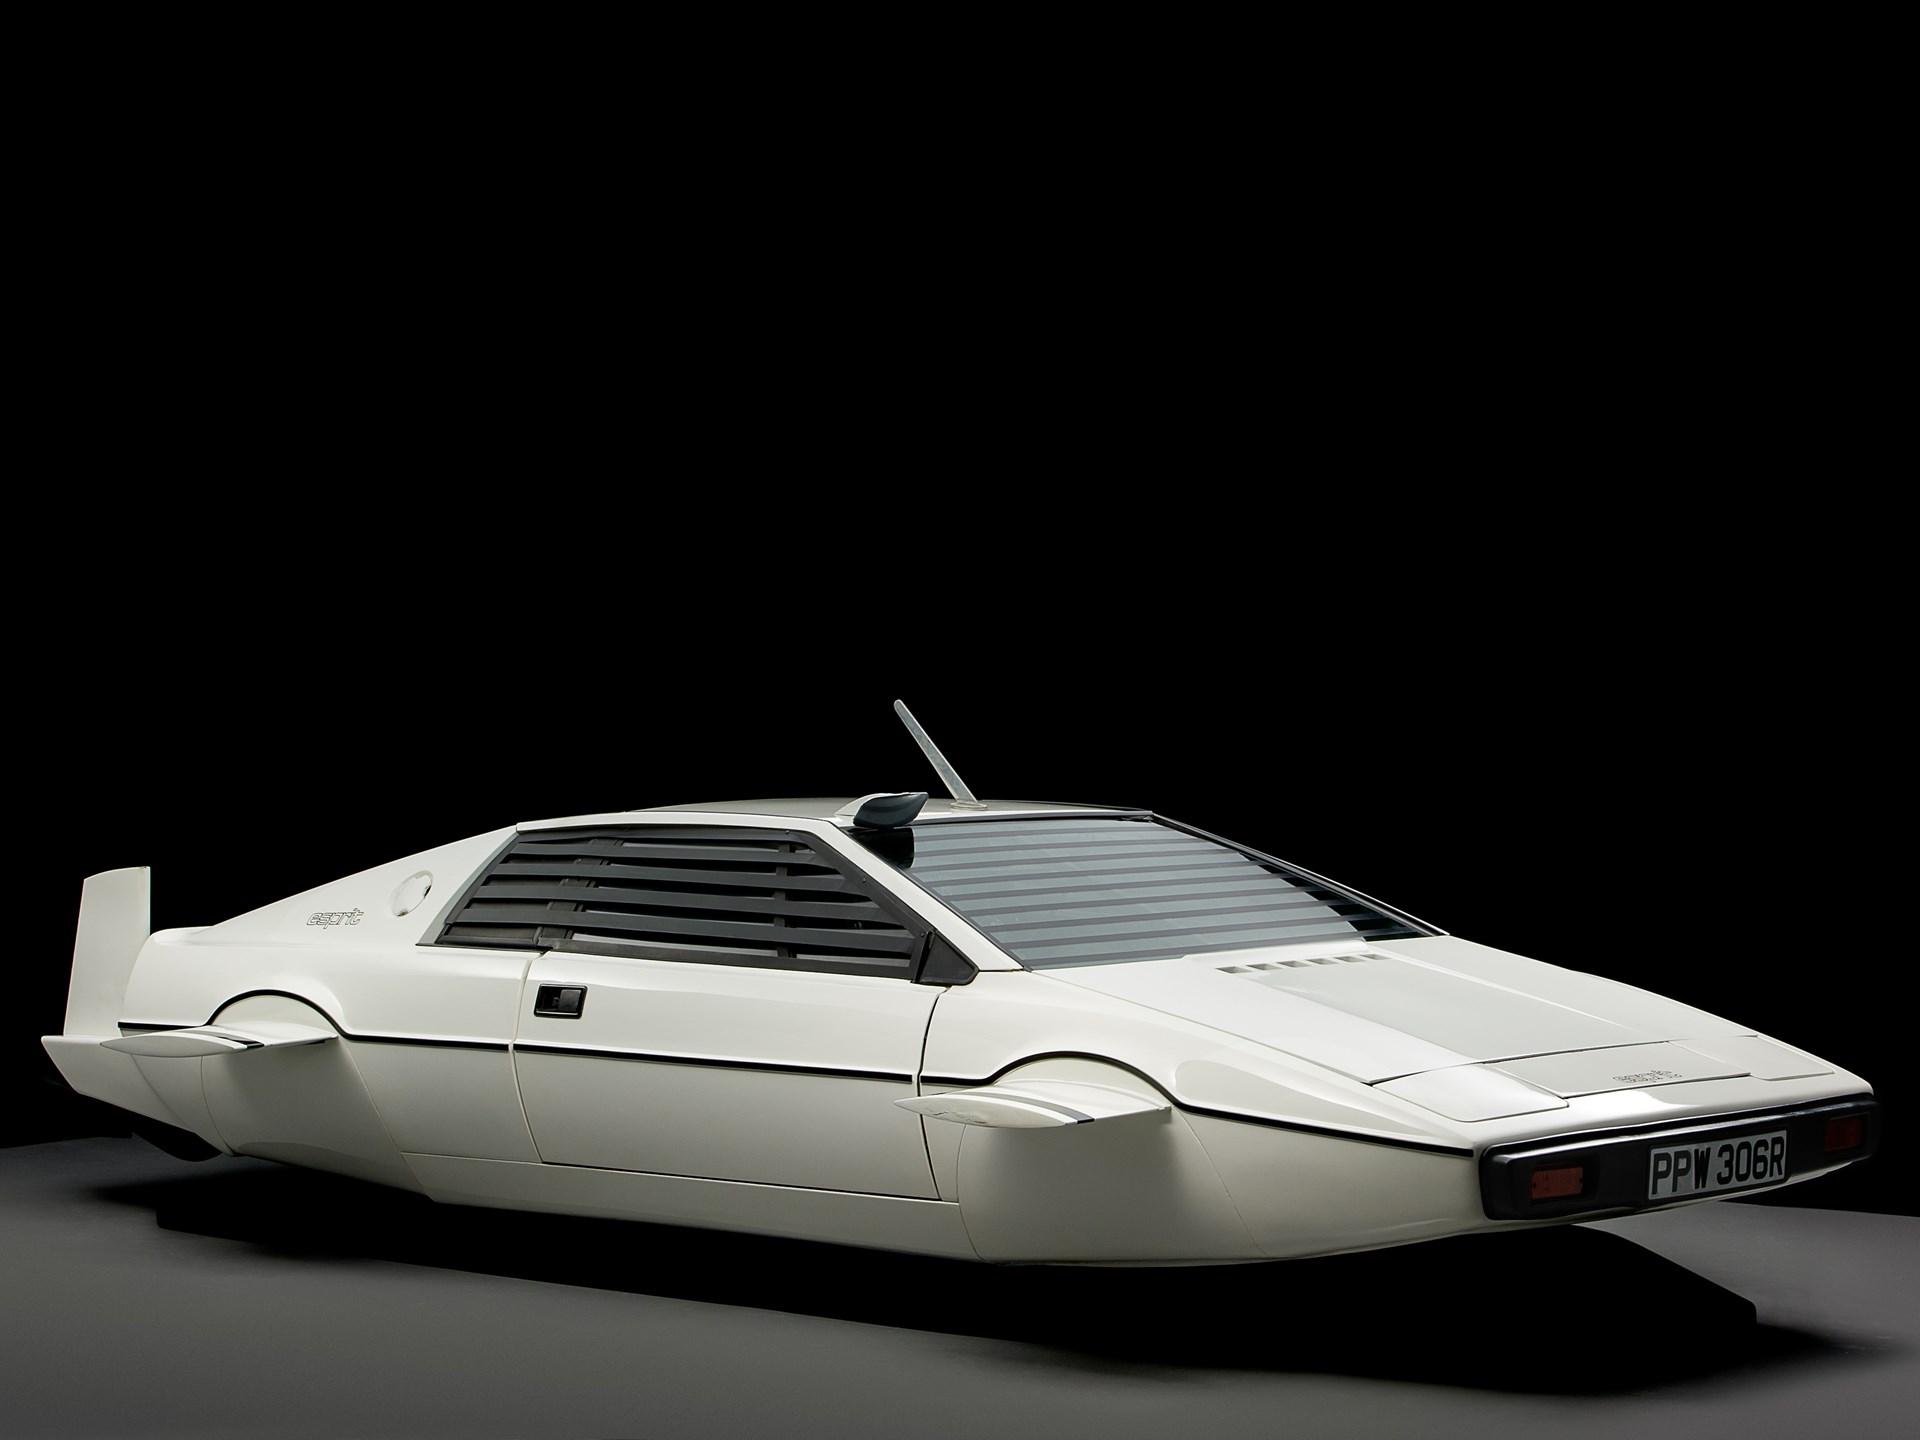 RM Sotheby's - 007 Lotus Esprit 'Submarine Car'   London 2013